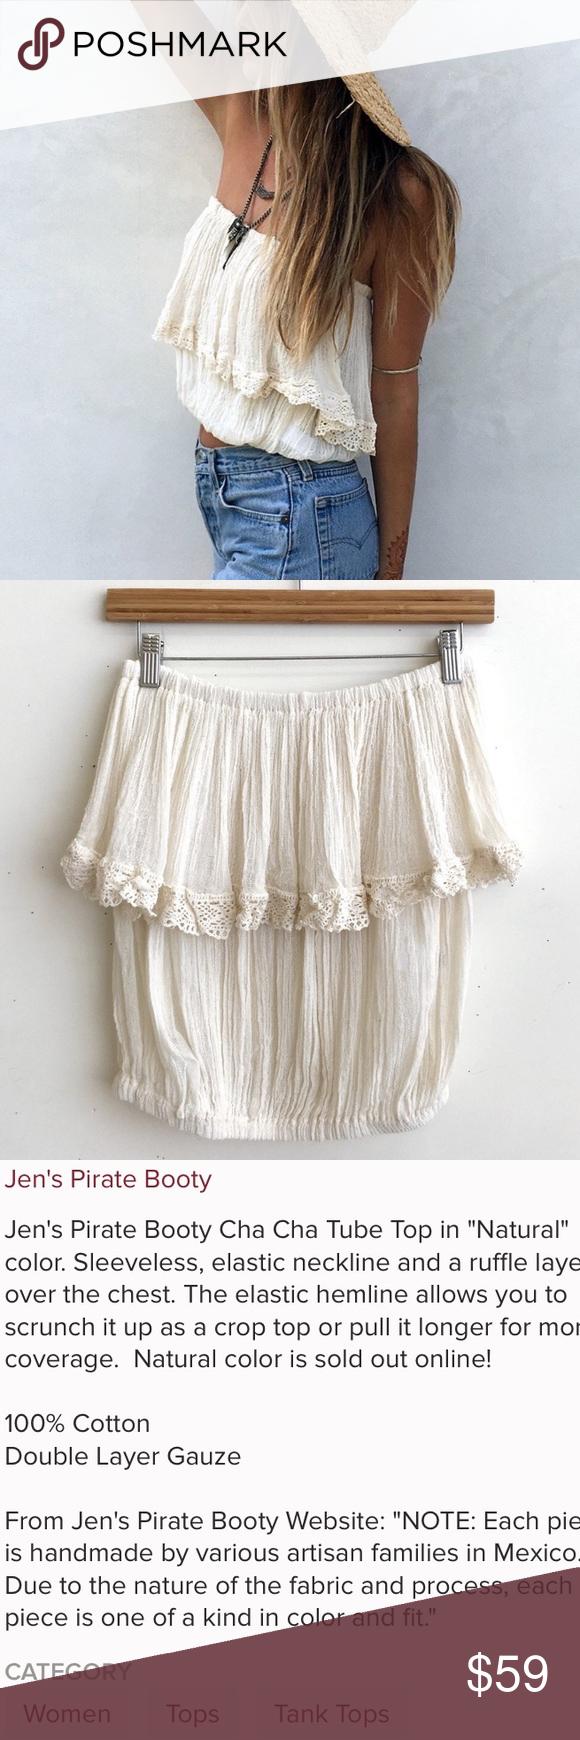 🌼 jen's pirate booty 🌼 cha cha top in off white | cha cha, free